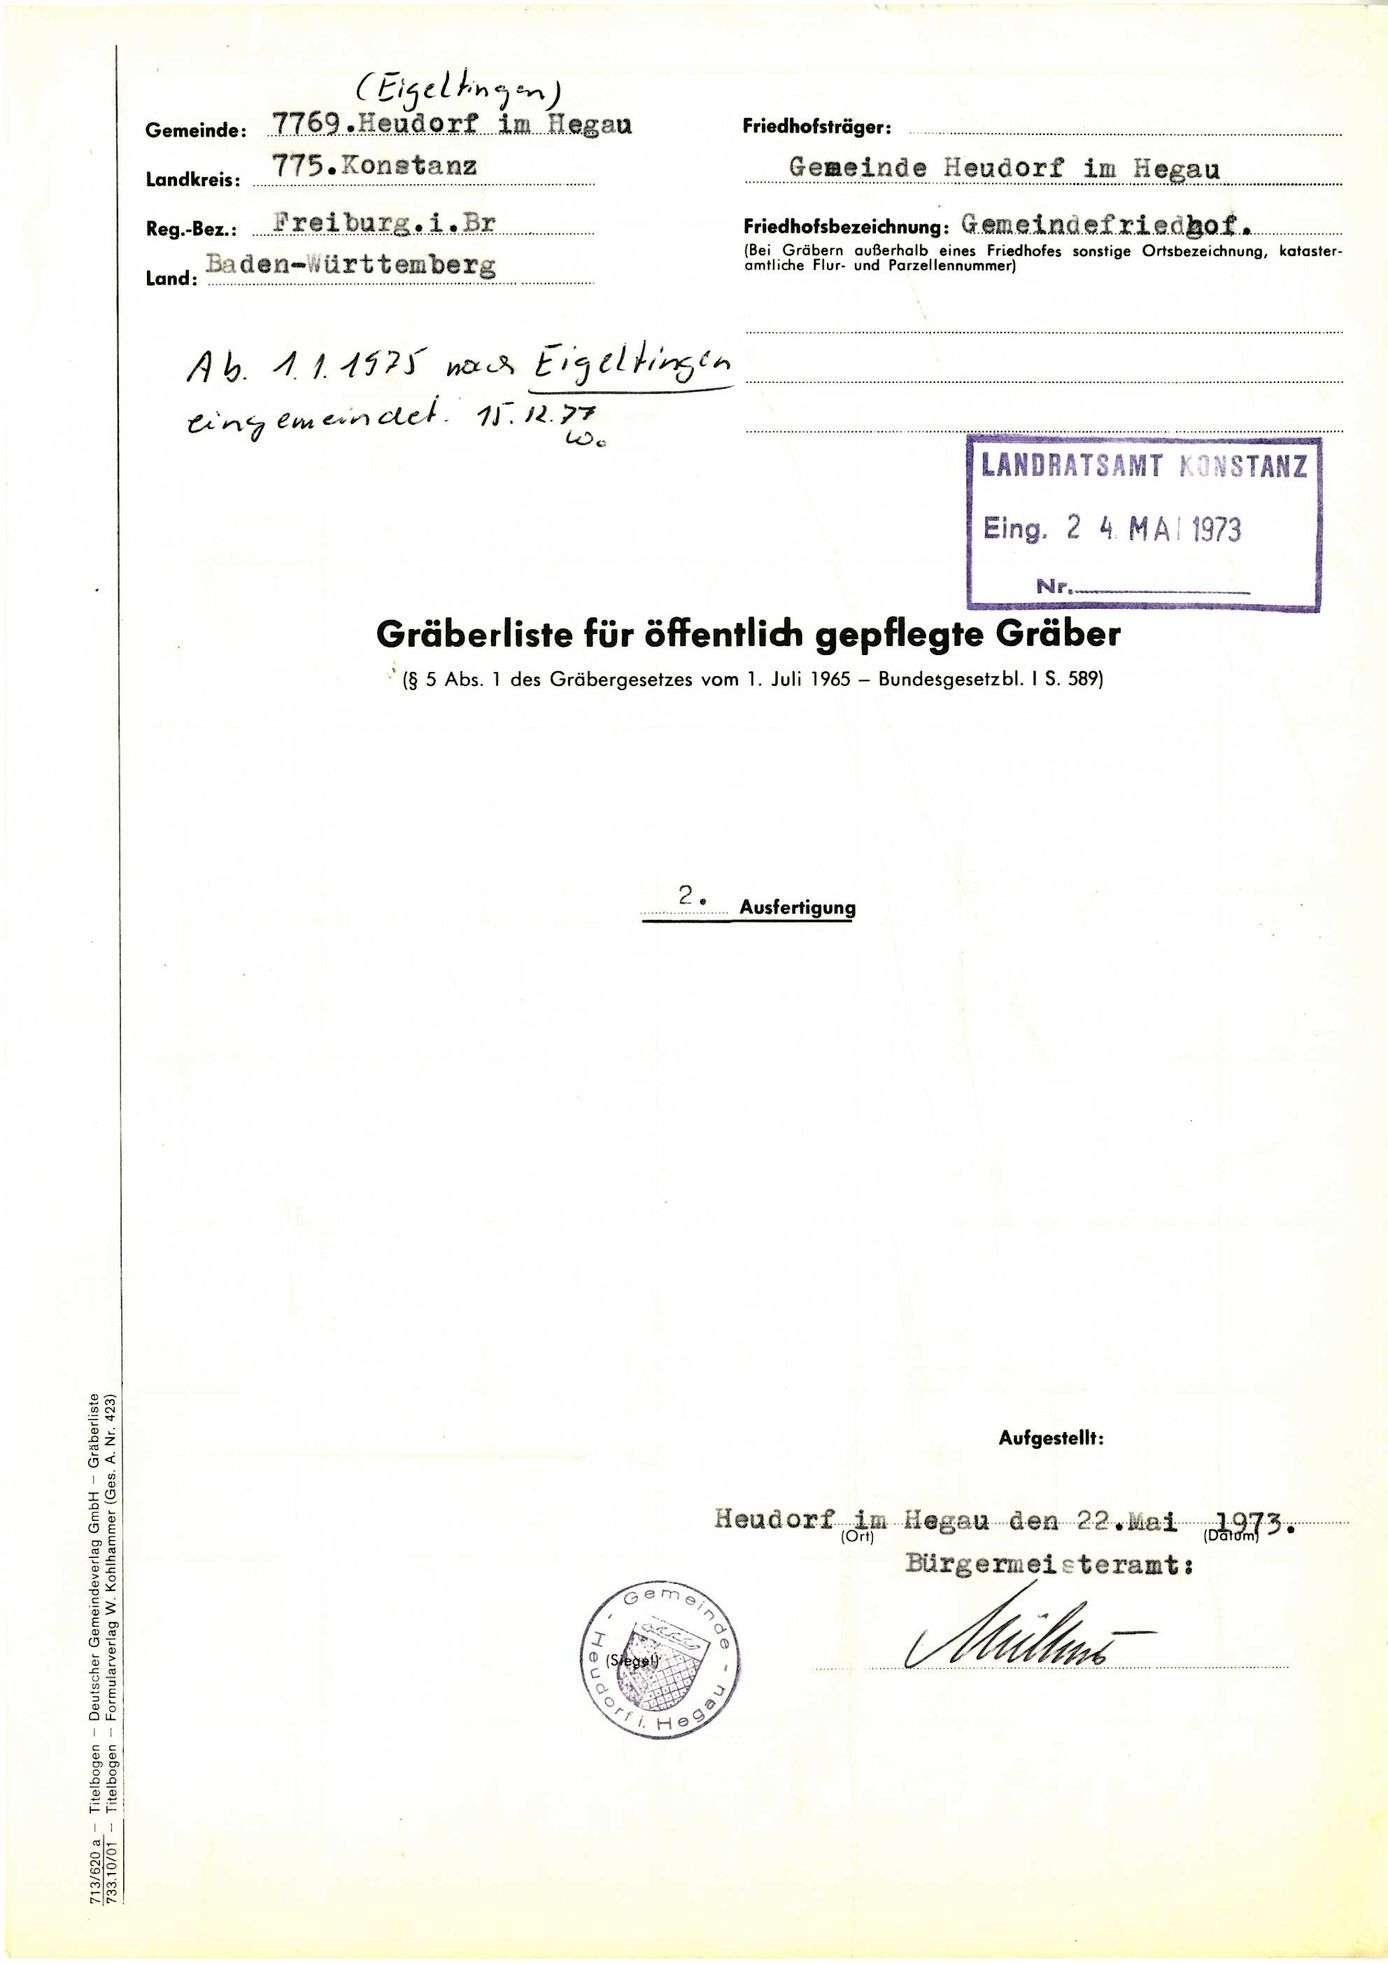 Heudorf im Hegau, Bild 1